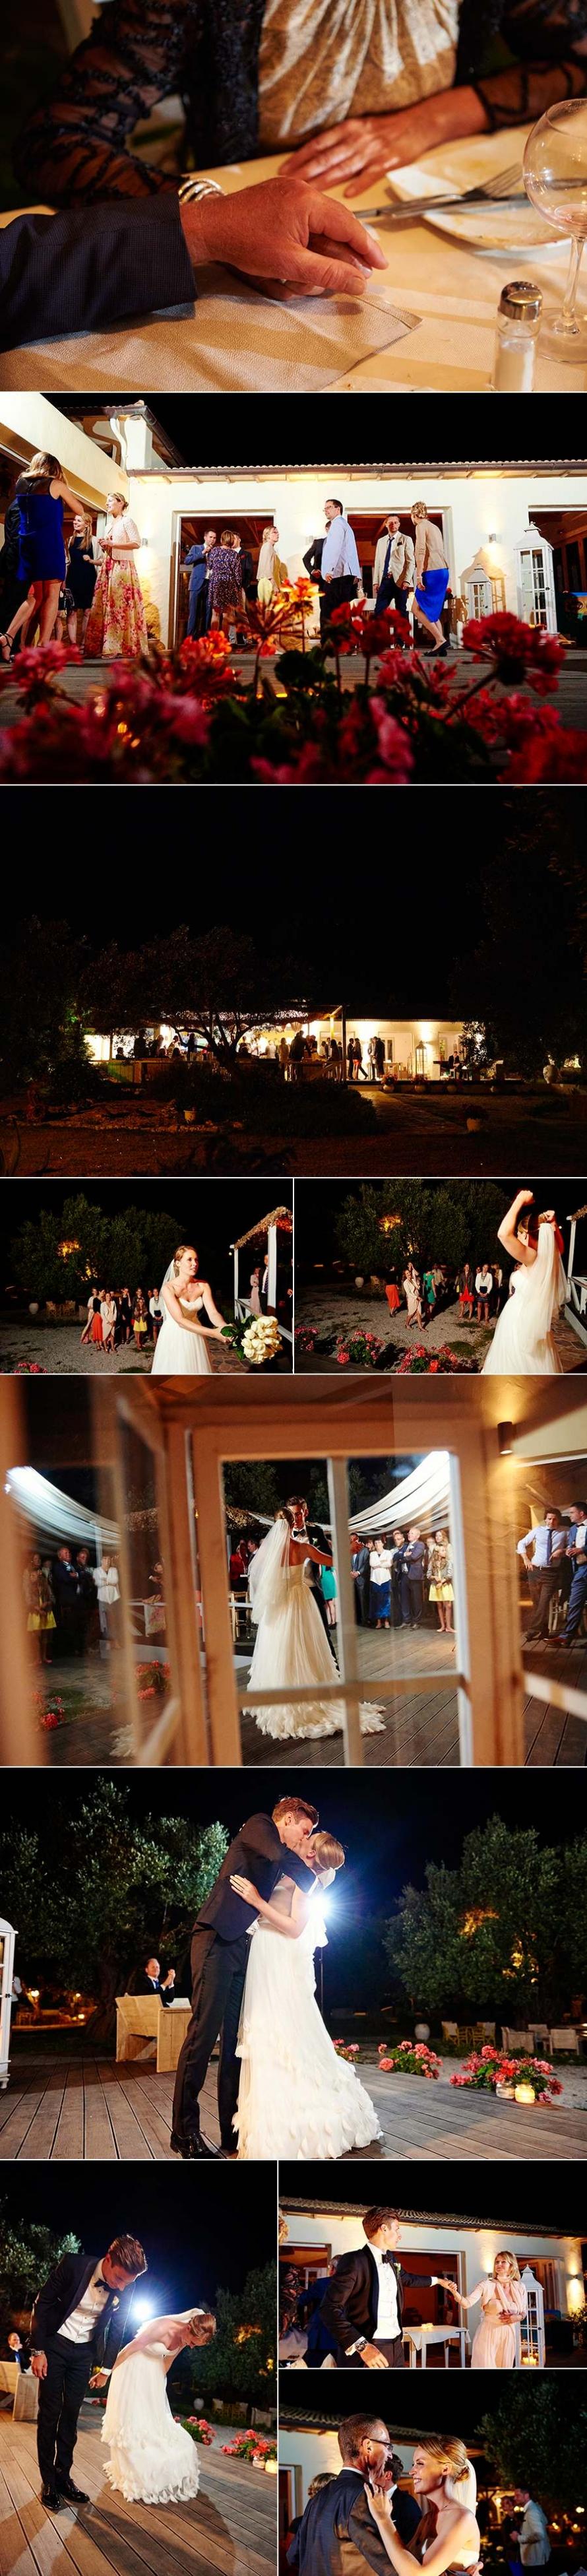 Tobi & Vanessa wedding photos 27